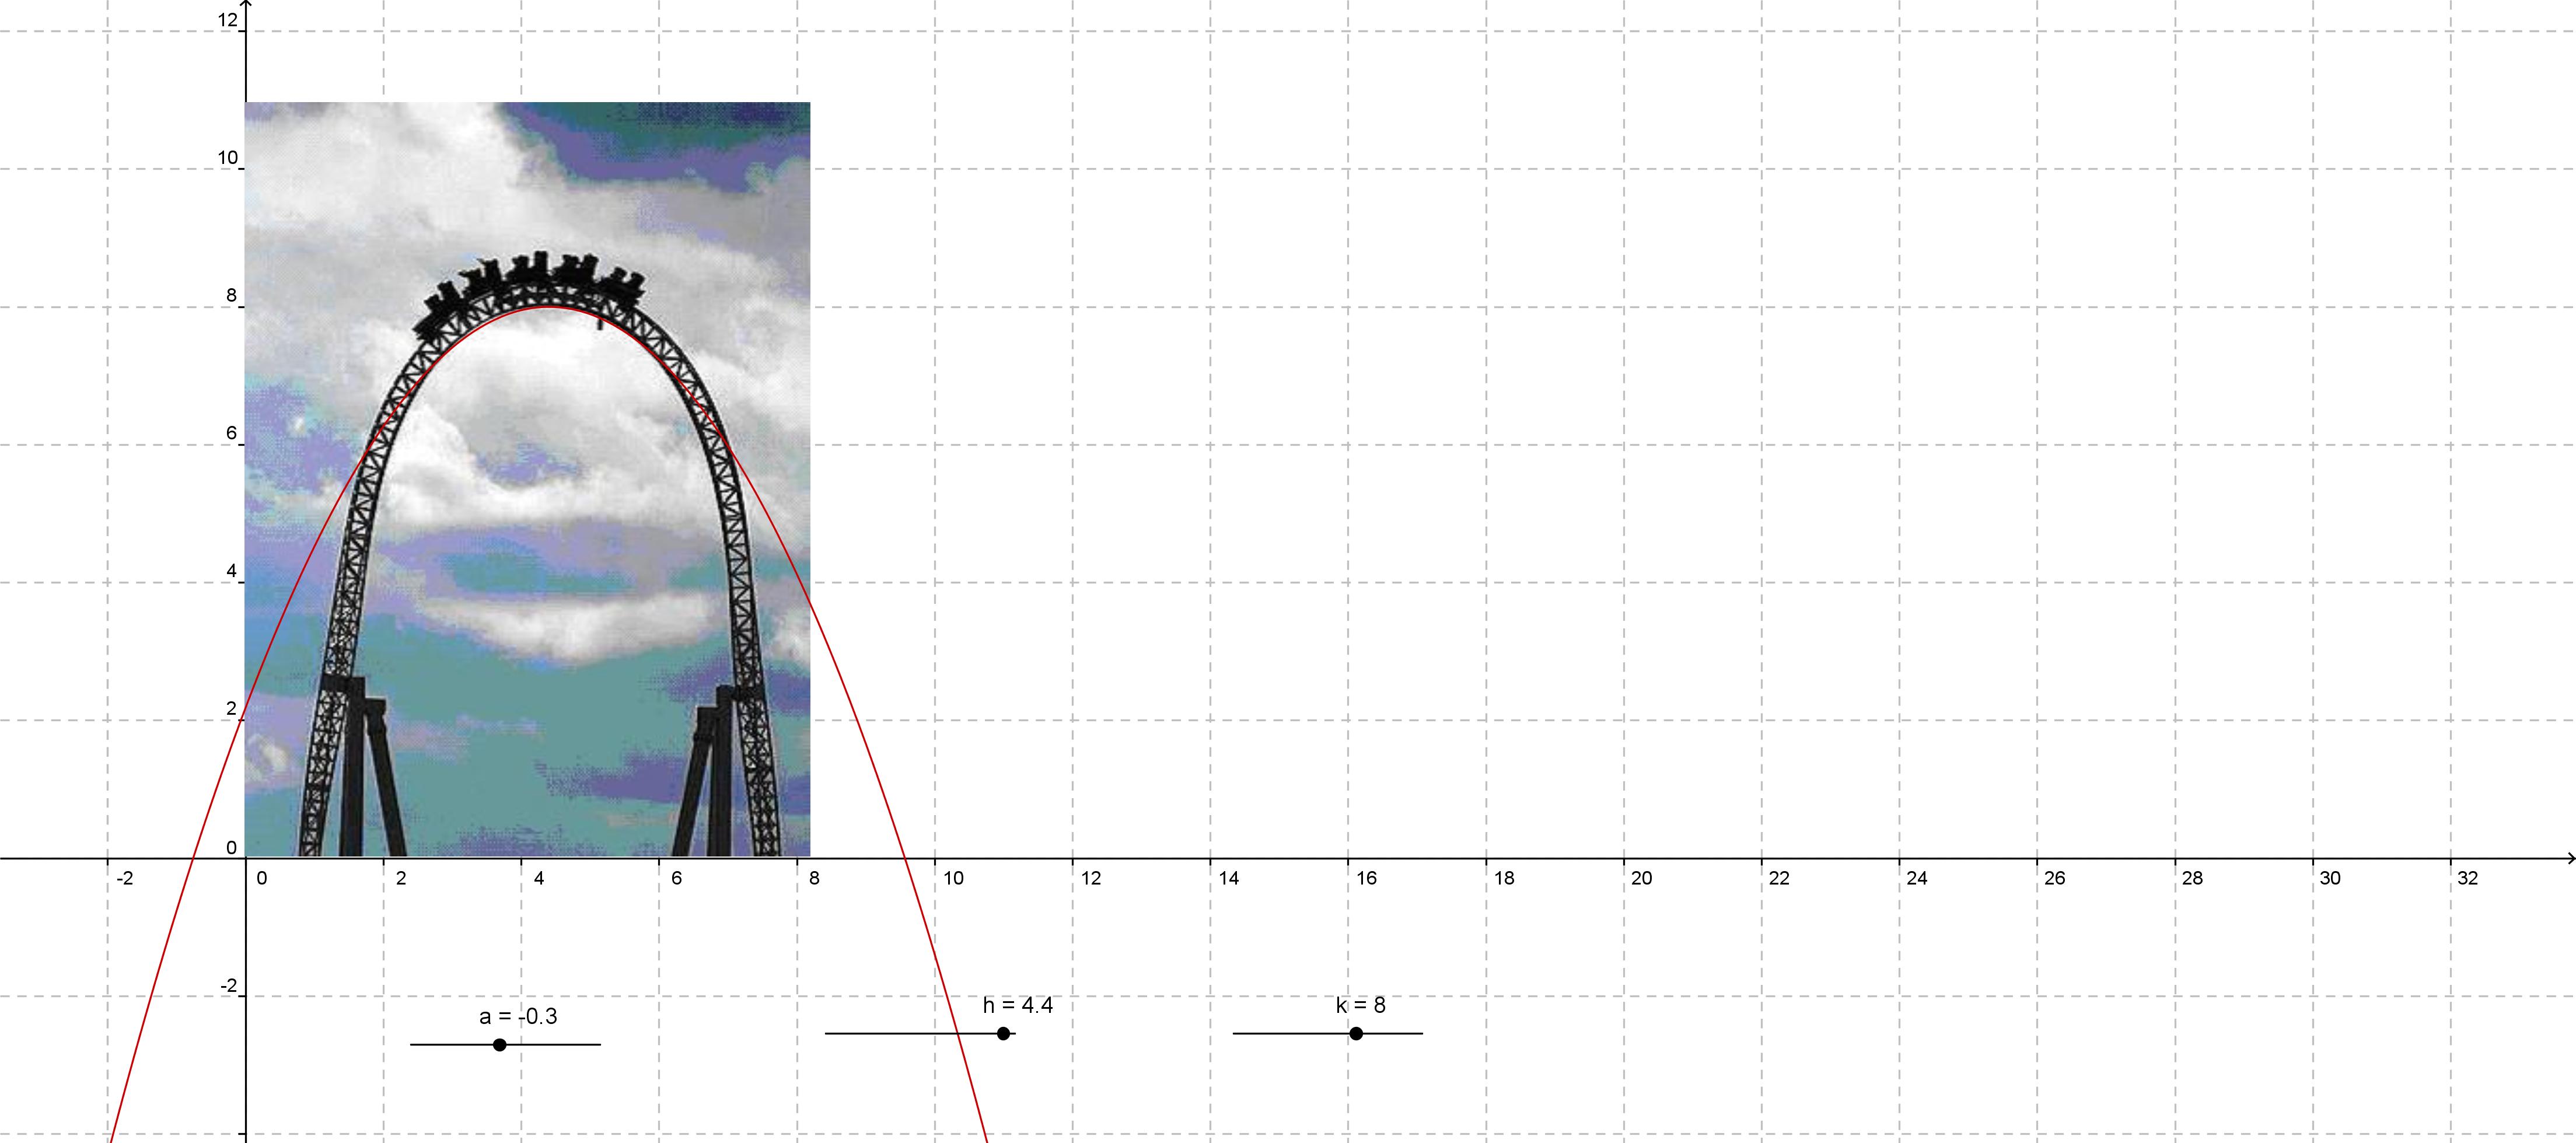 real world quadratic functions The quadratic formula is a great method for solving any quadratic equation home quadratic equations quadratic formula quadratic formula we'll look at a real world application using quadratic equations.